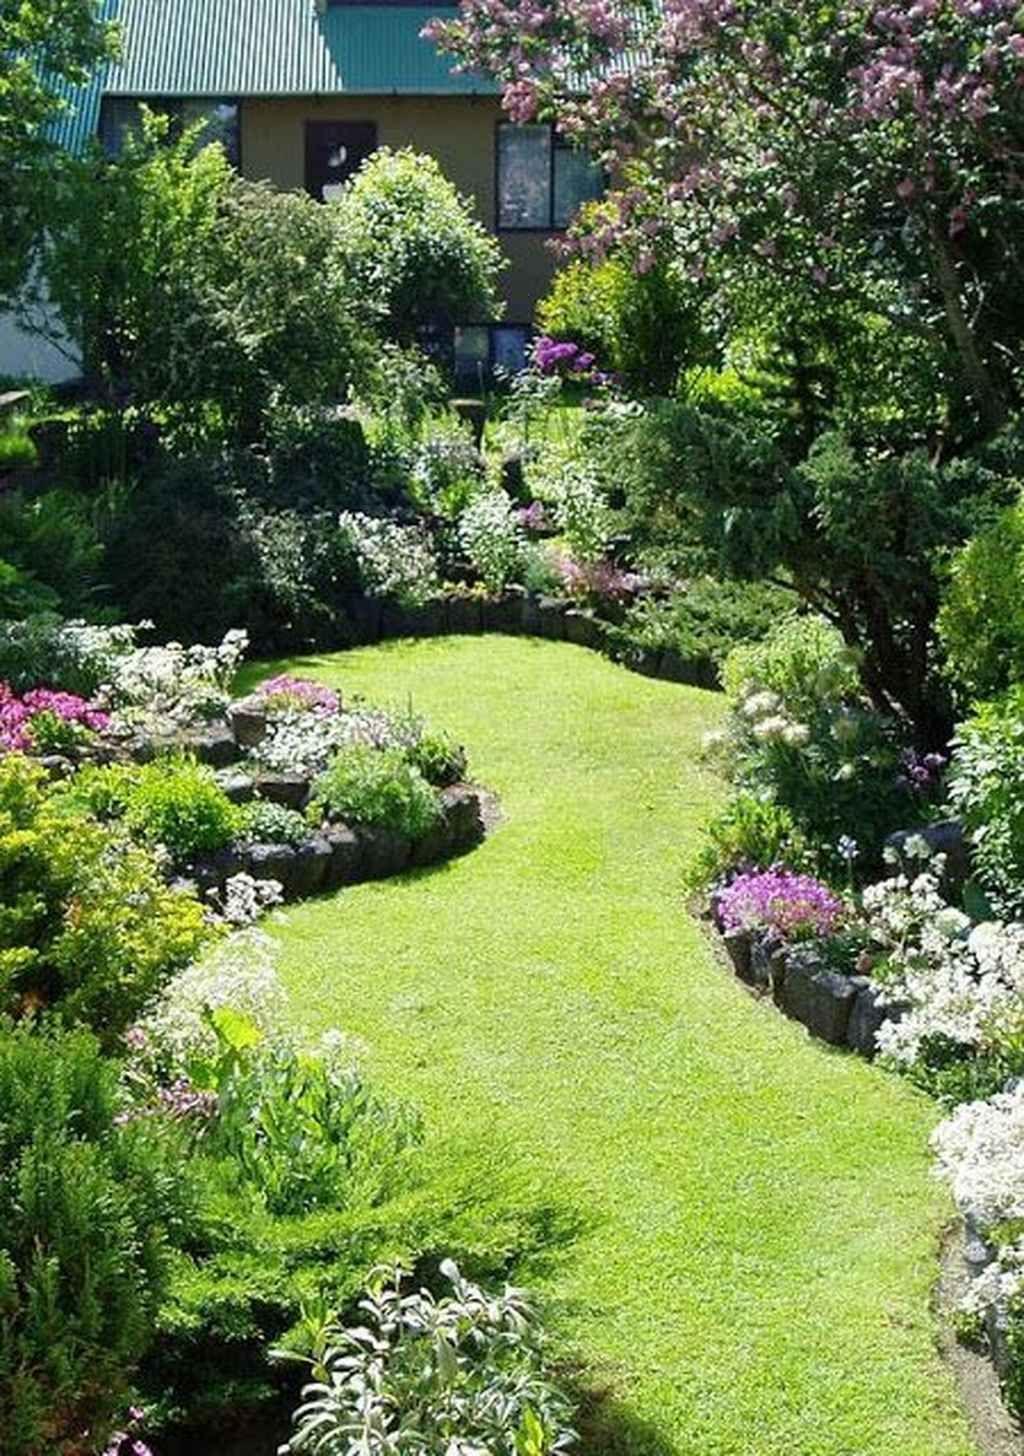 90 Stunning Small Cottage Garden Ideas for Backyard Landscaping #smallgardenideas